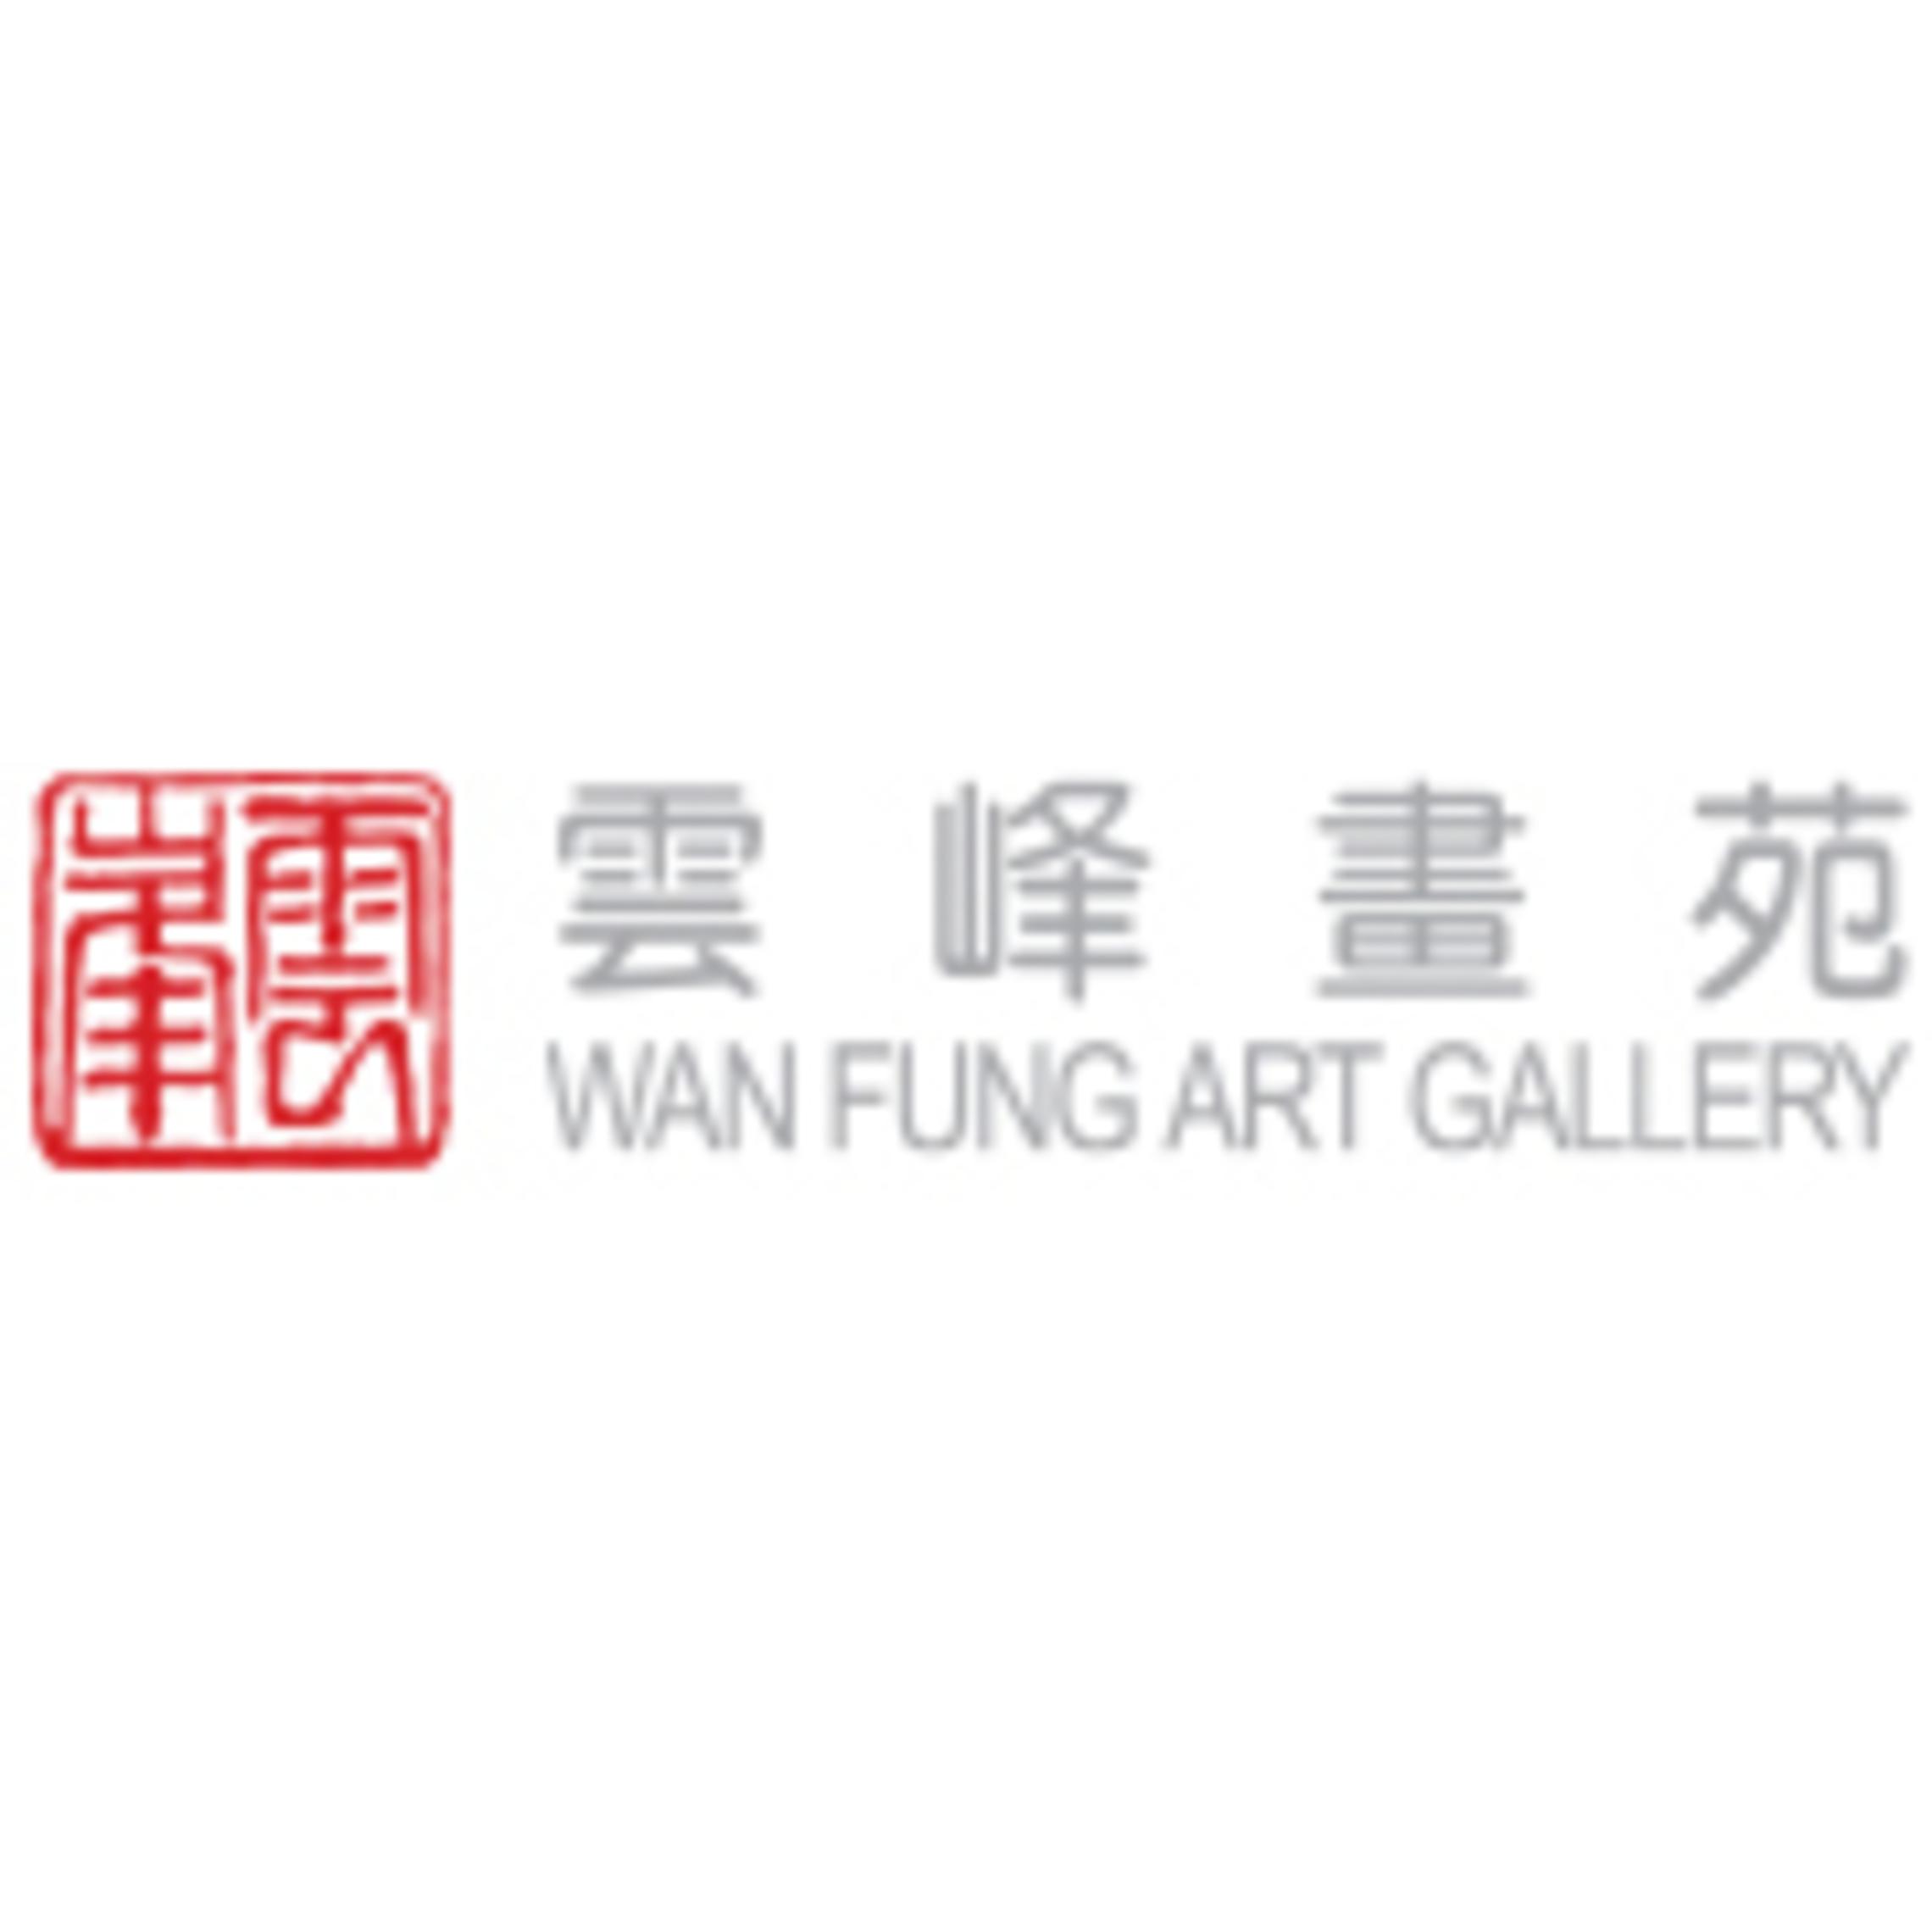 wan fung art- company logo